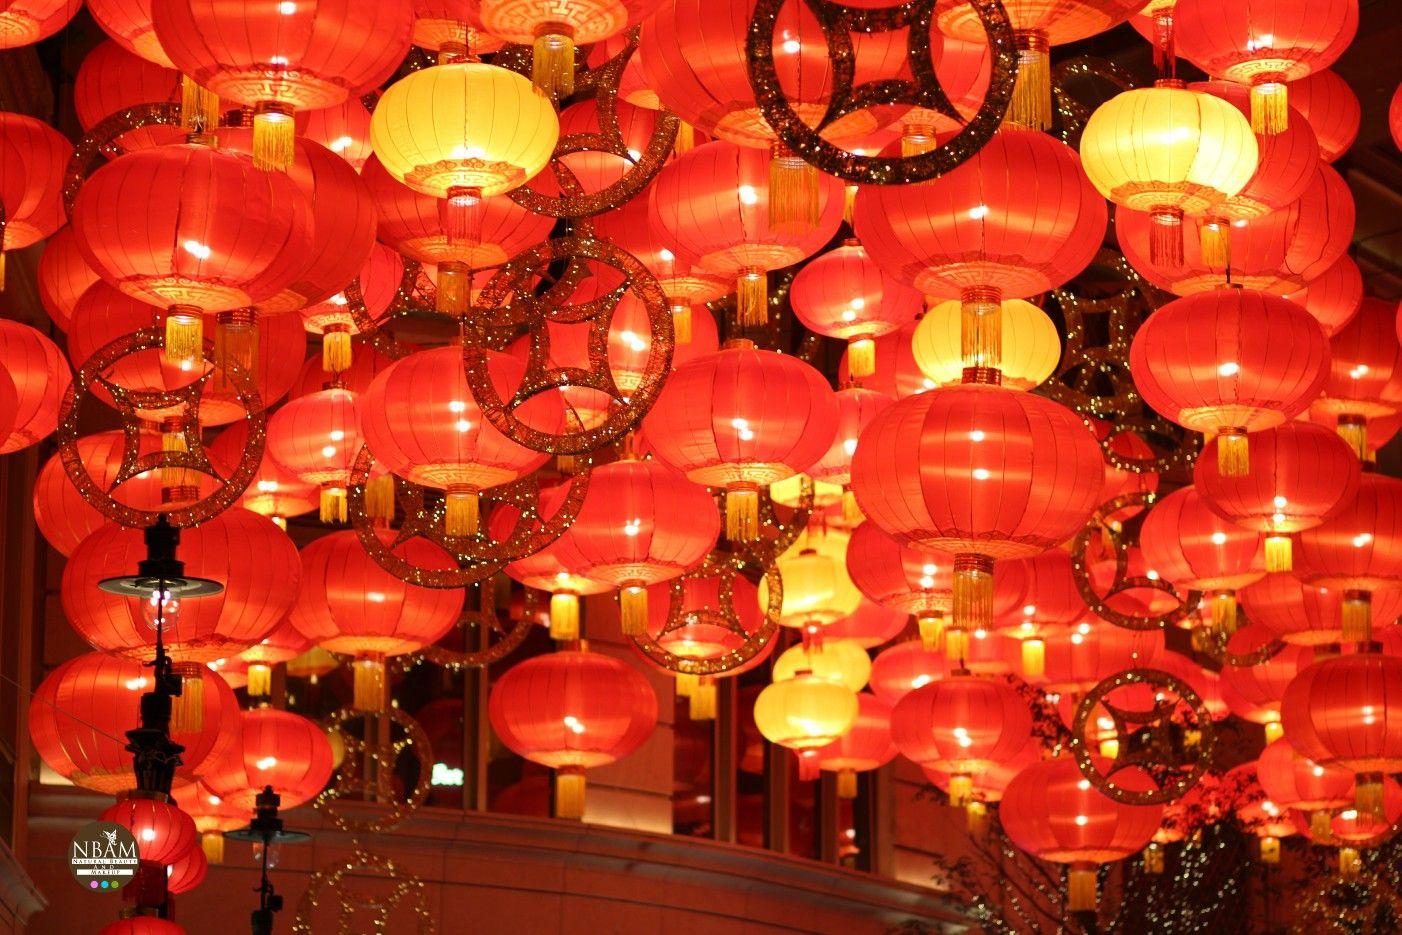 The chinesenewyear special stunning red lanterns 😍 🌸